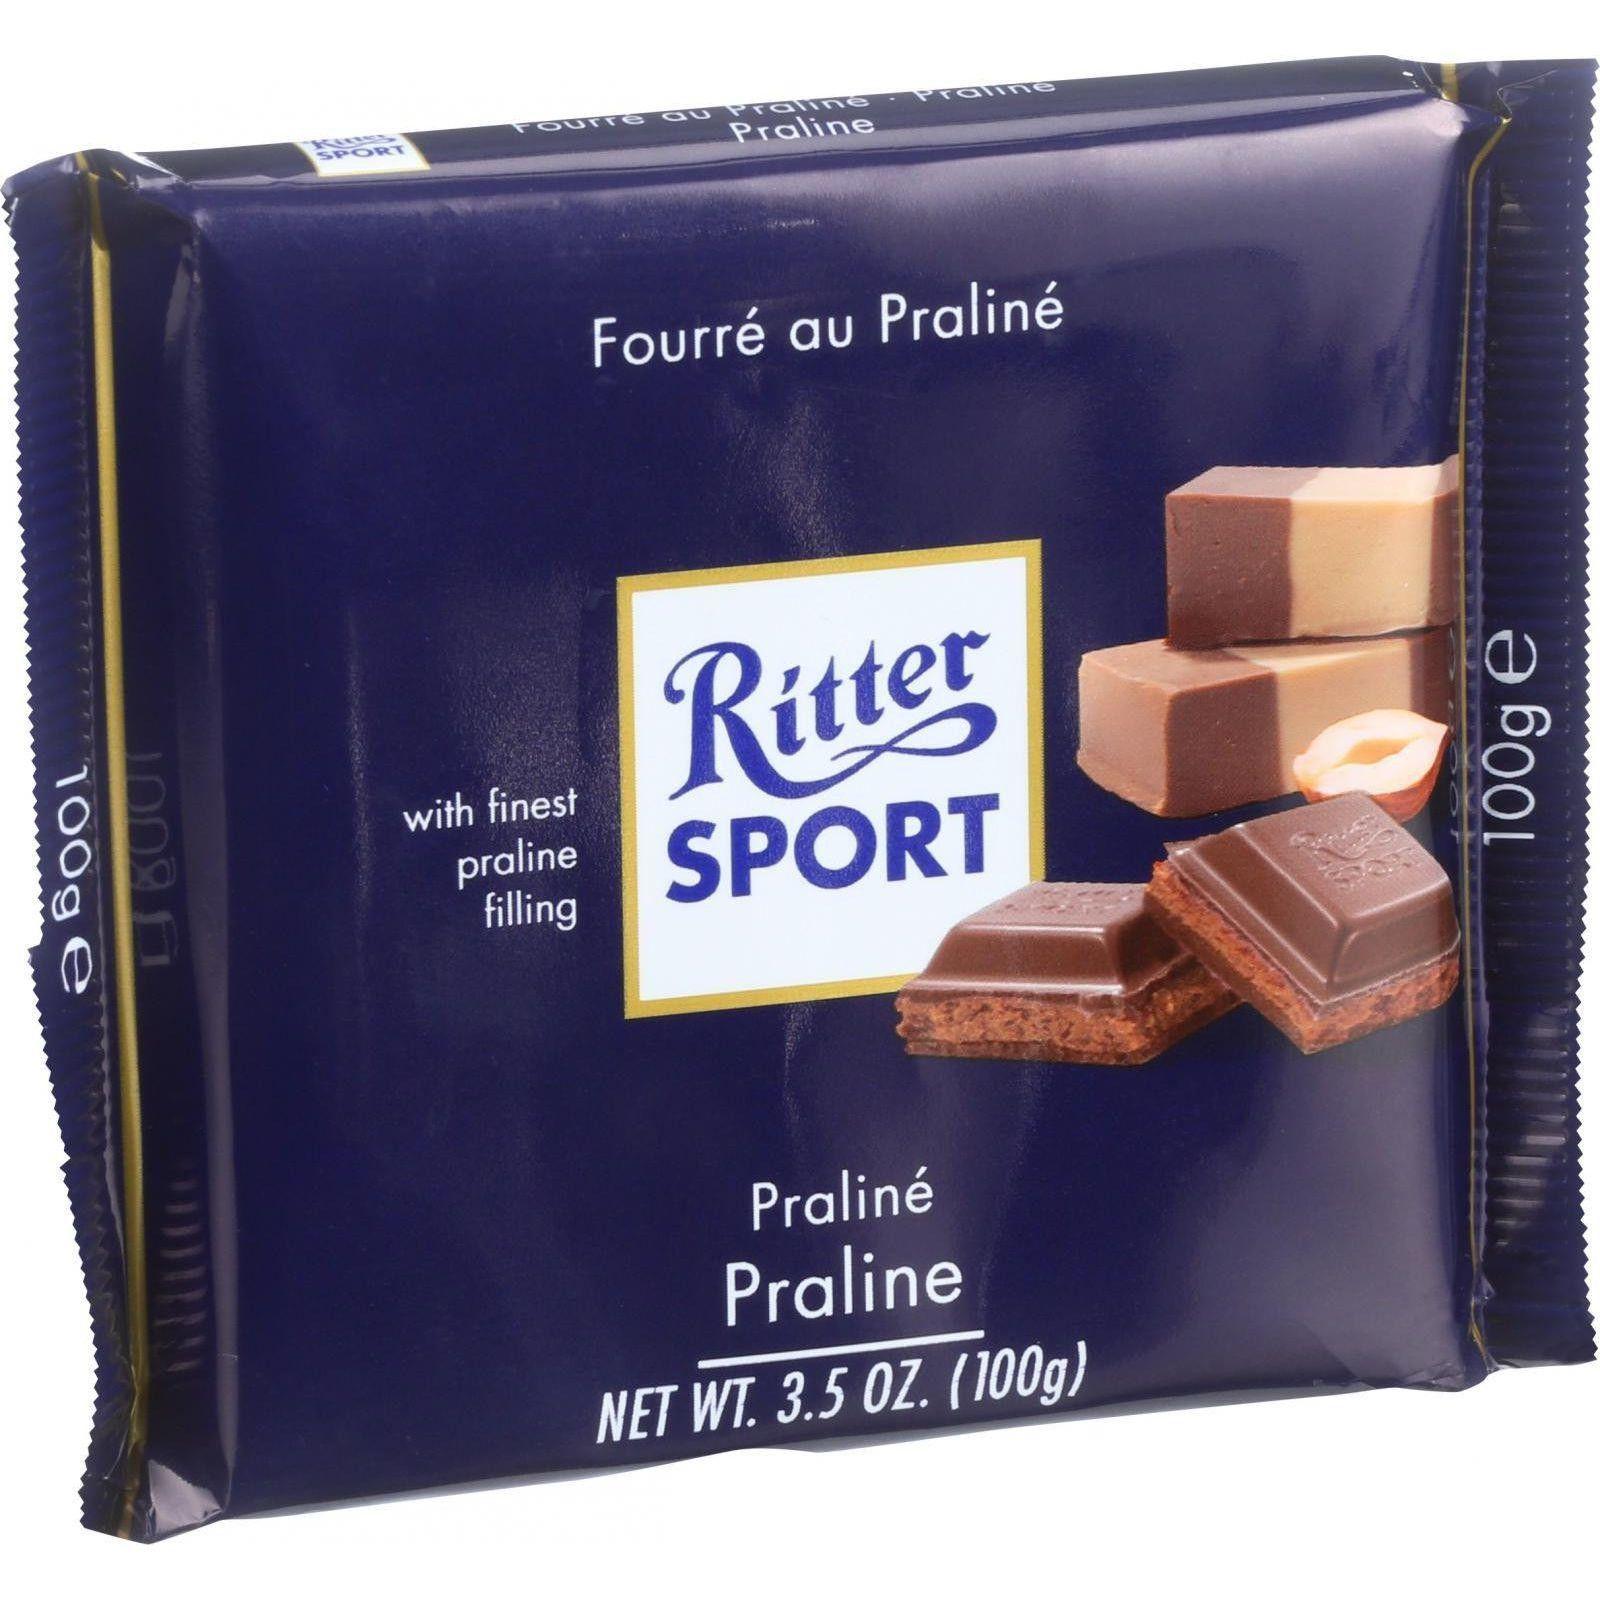 Ritter Sport Chocolate Bar Milk Chocolate Praline